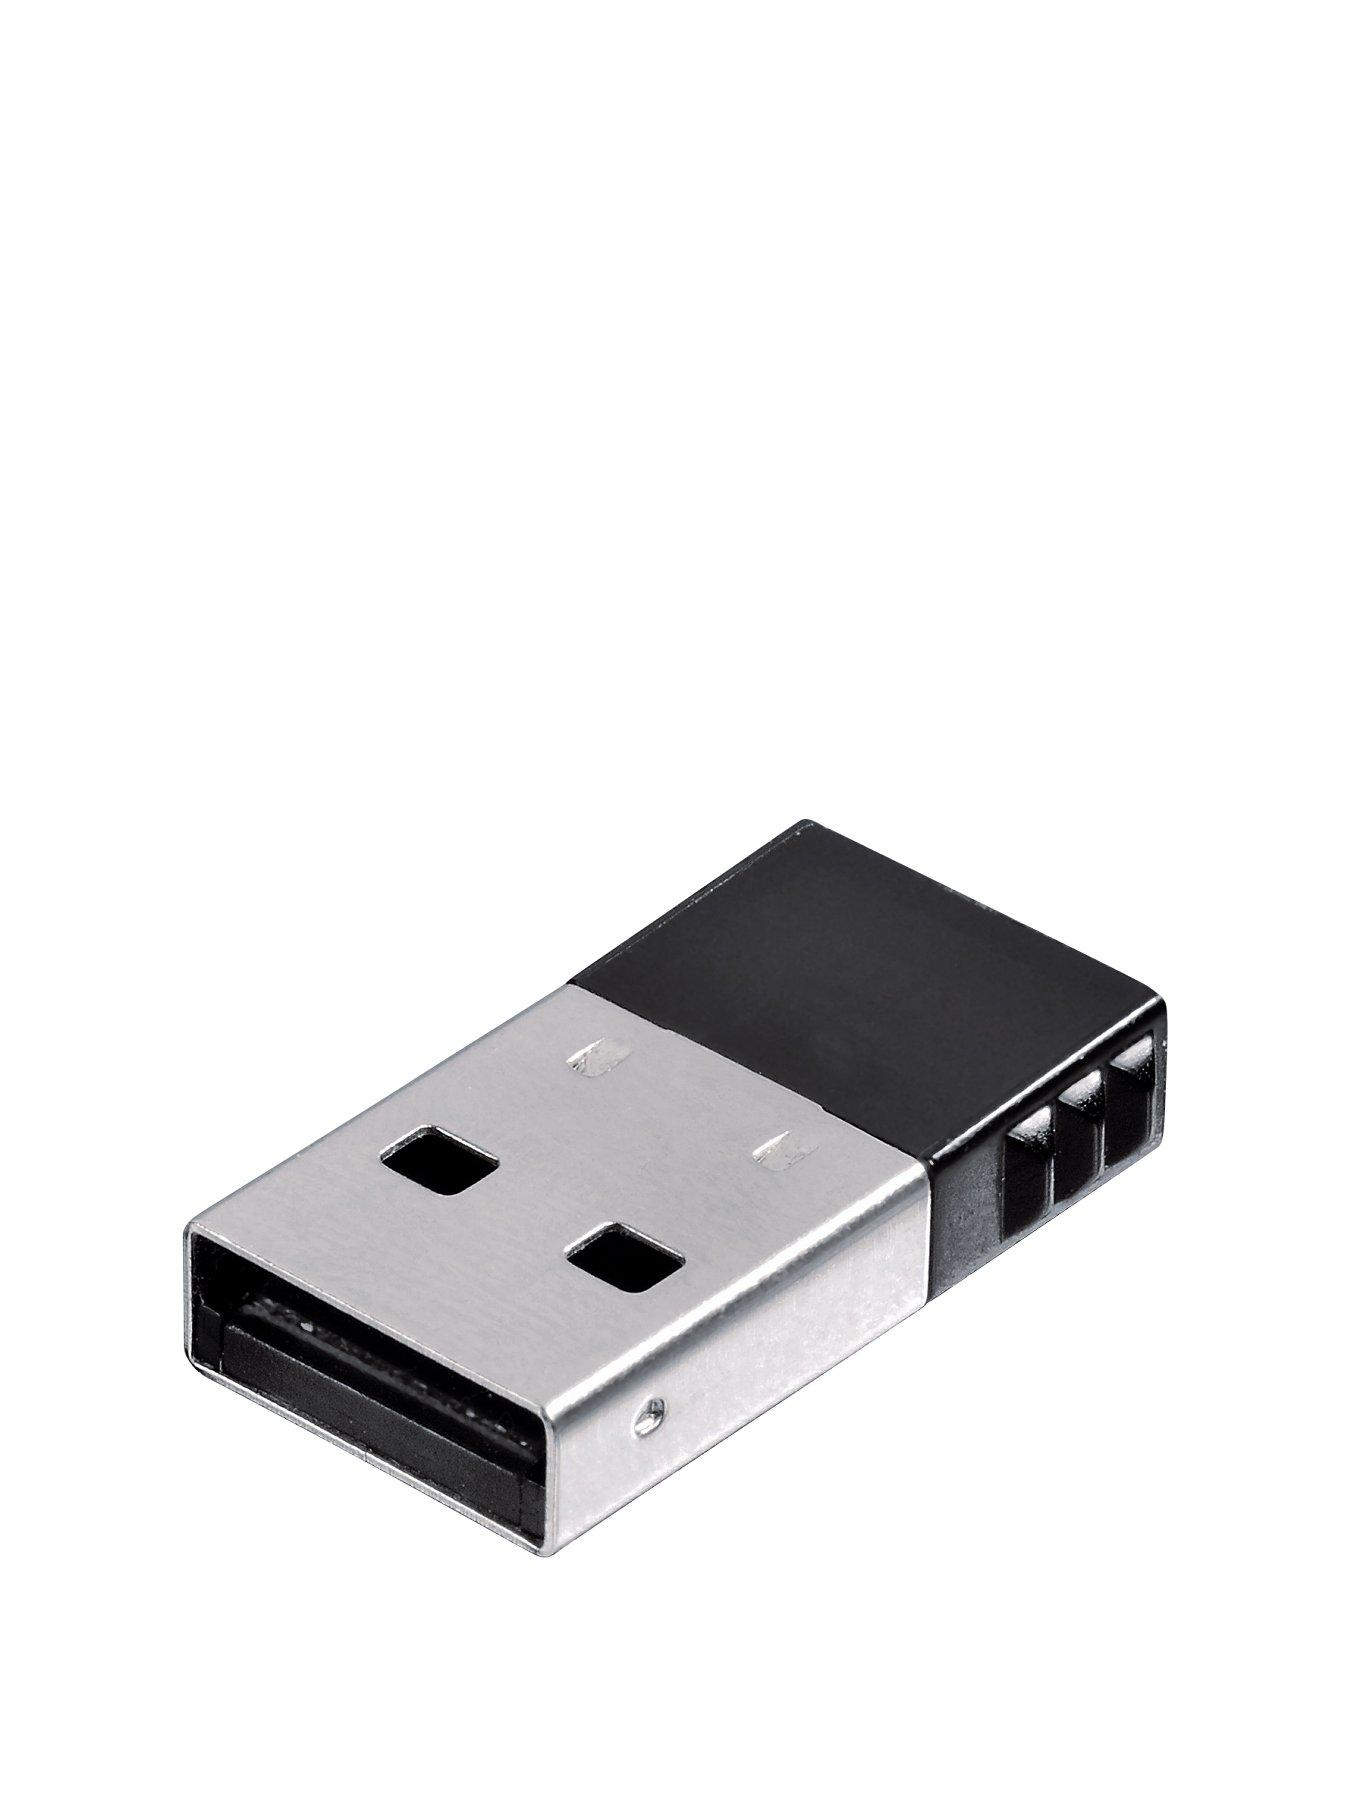 HAMA Class 1 Nano Bluetooth USB Adaptor, 3.0+EDR